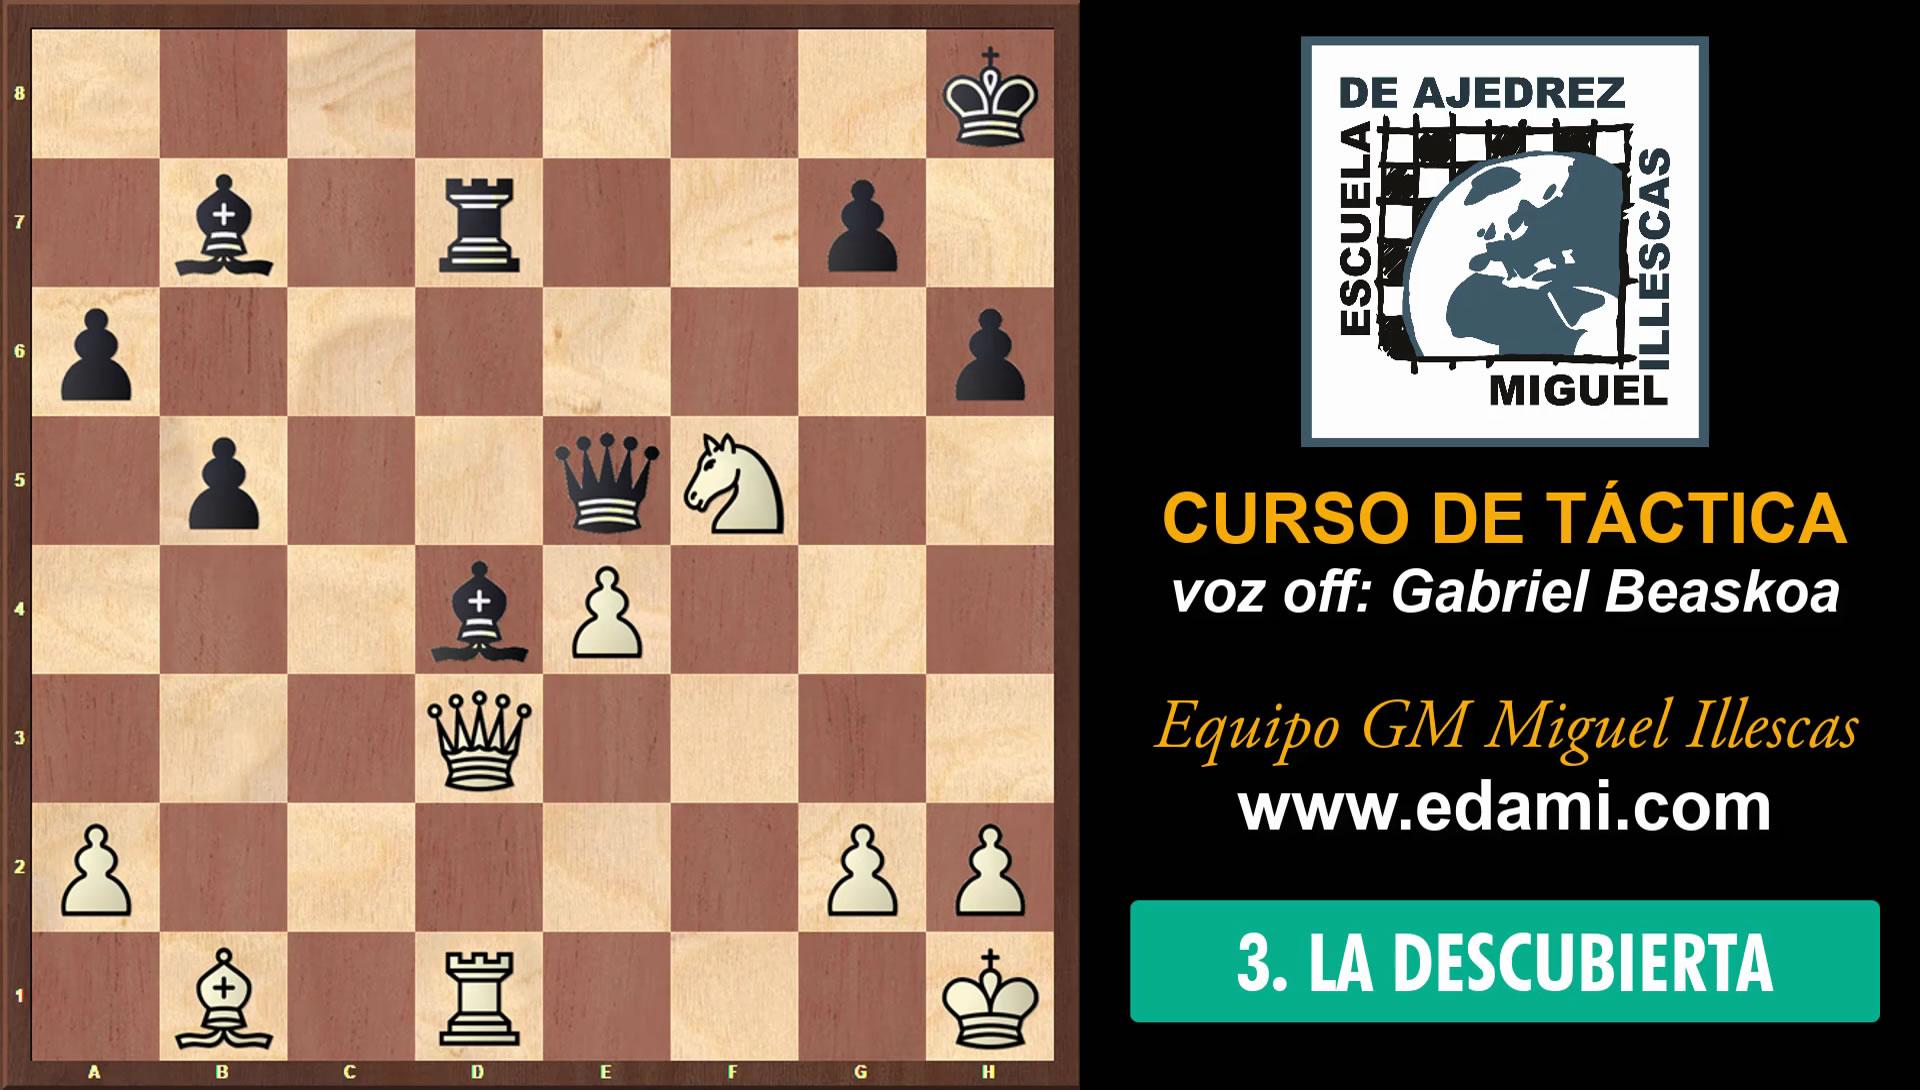 Curso de Táctica de ajedrez EDAMI #03 - La Descubierta